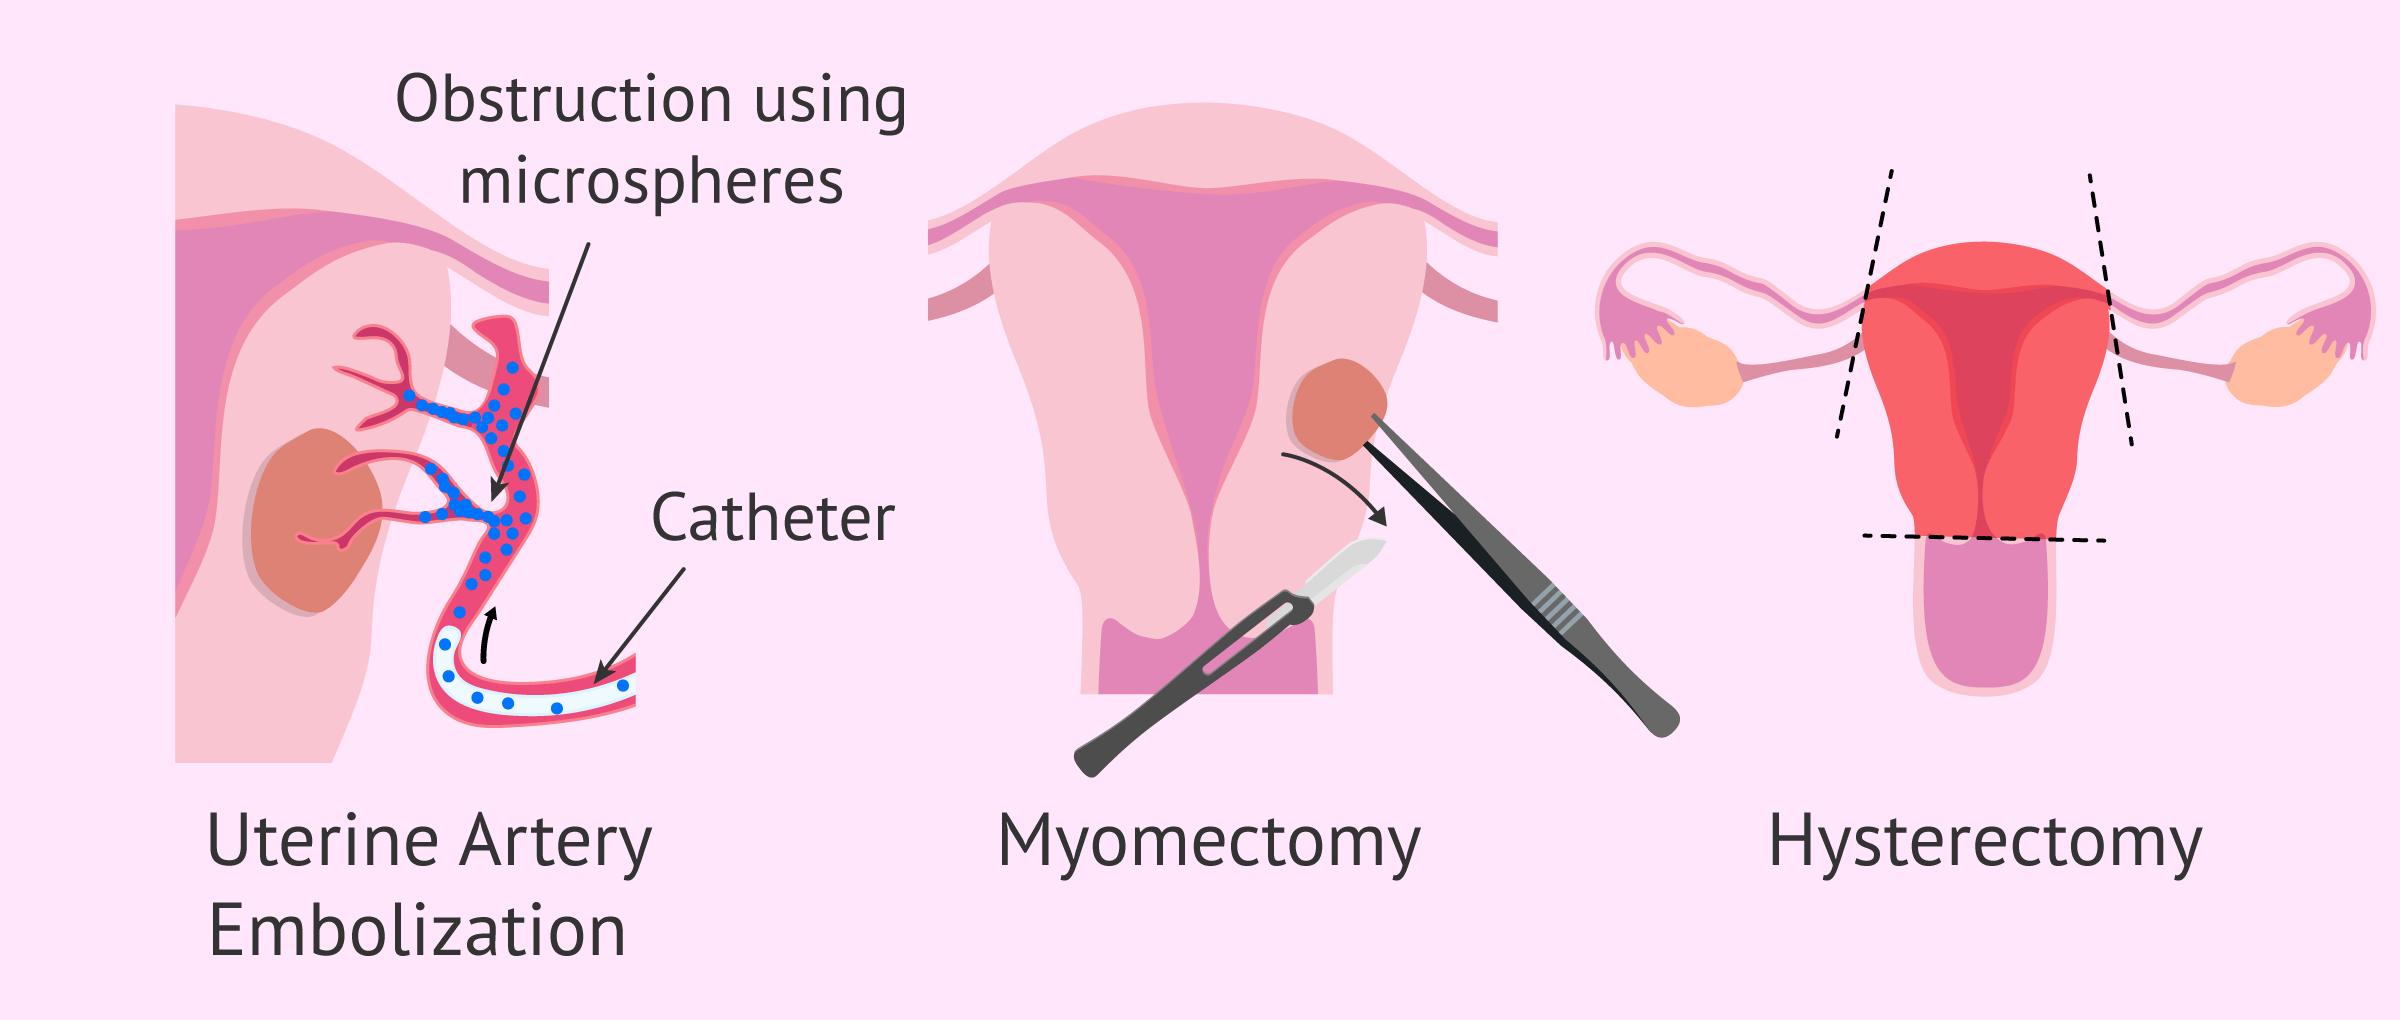 Imagen: Invasive treatments for myomatosis